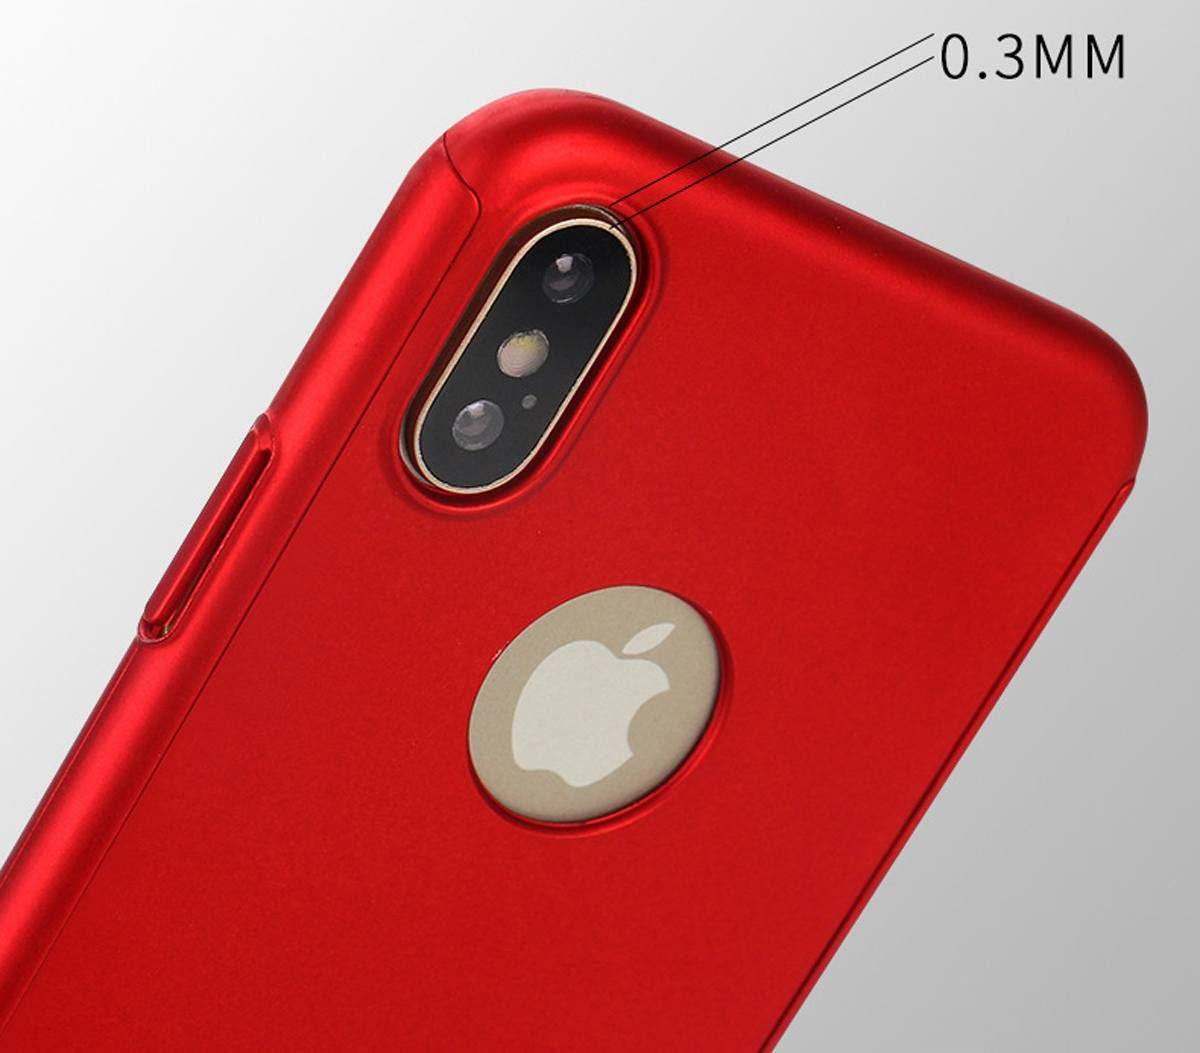 For-Apple-iPhone-XS-Max-XR-Hybrid-360-Slim-Ultra-Thin-Heavy-Duty-Shockproof-Case Indexbild 39